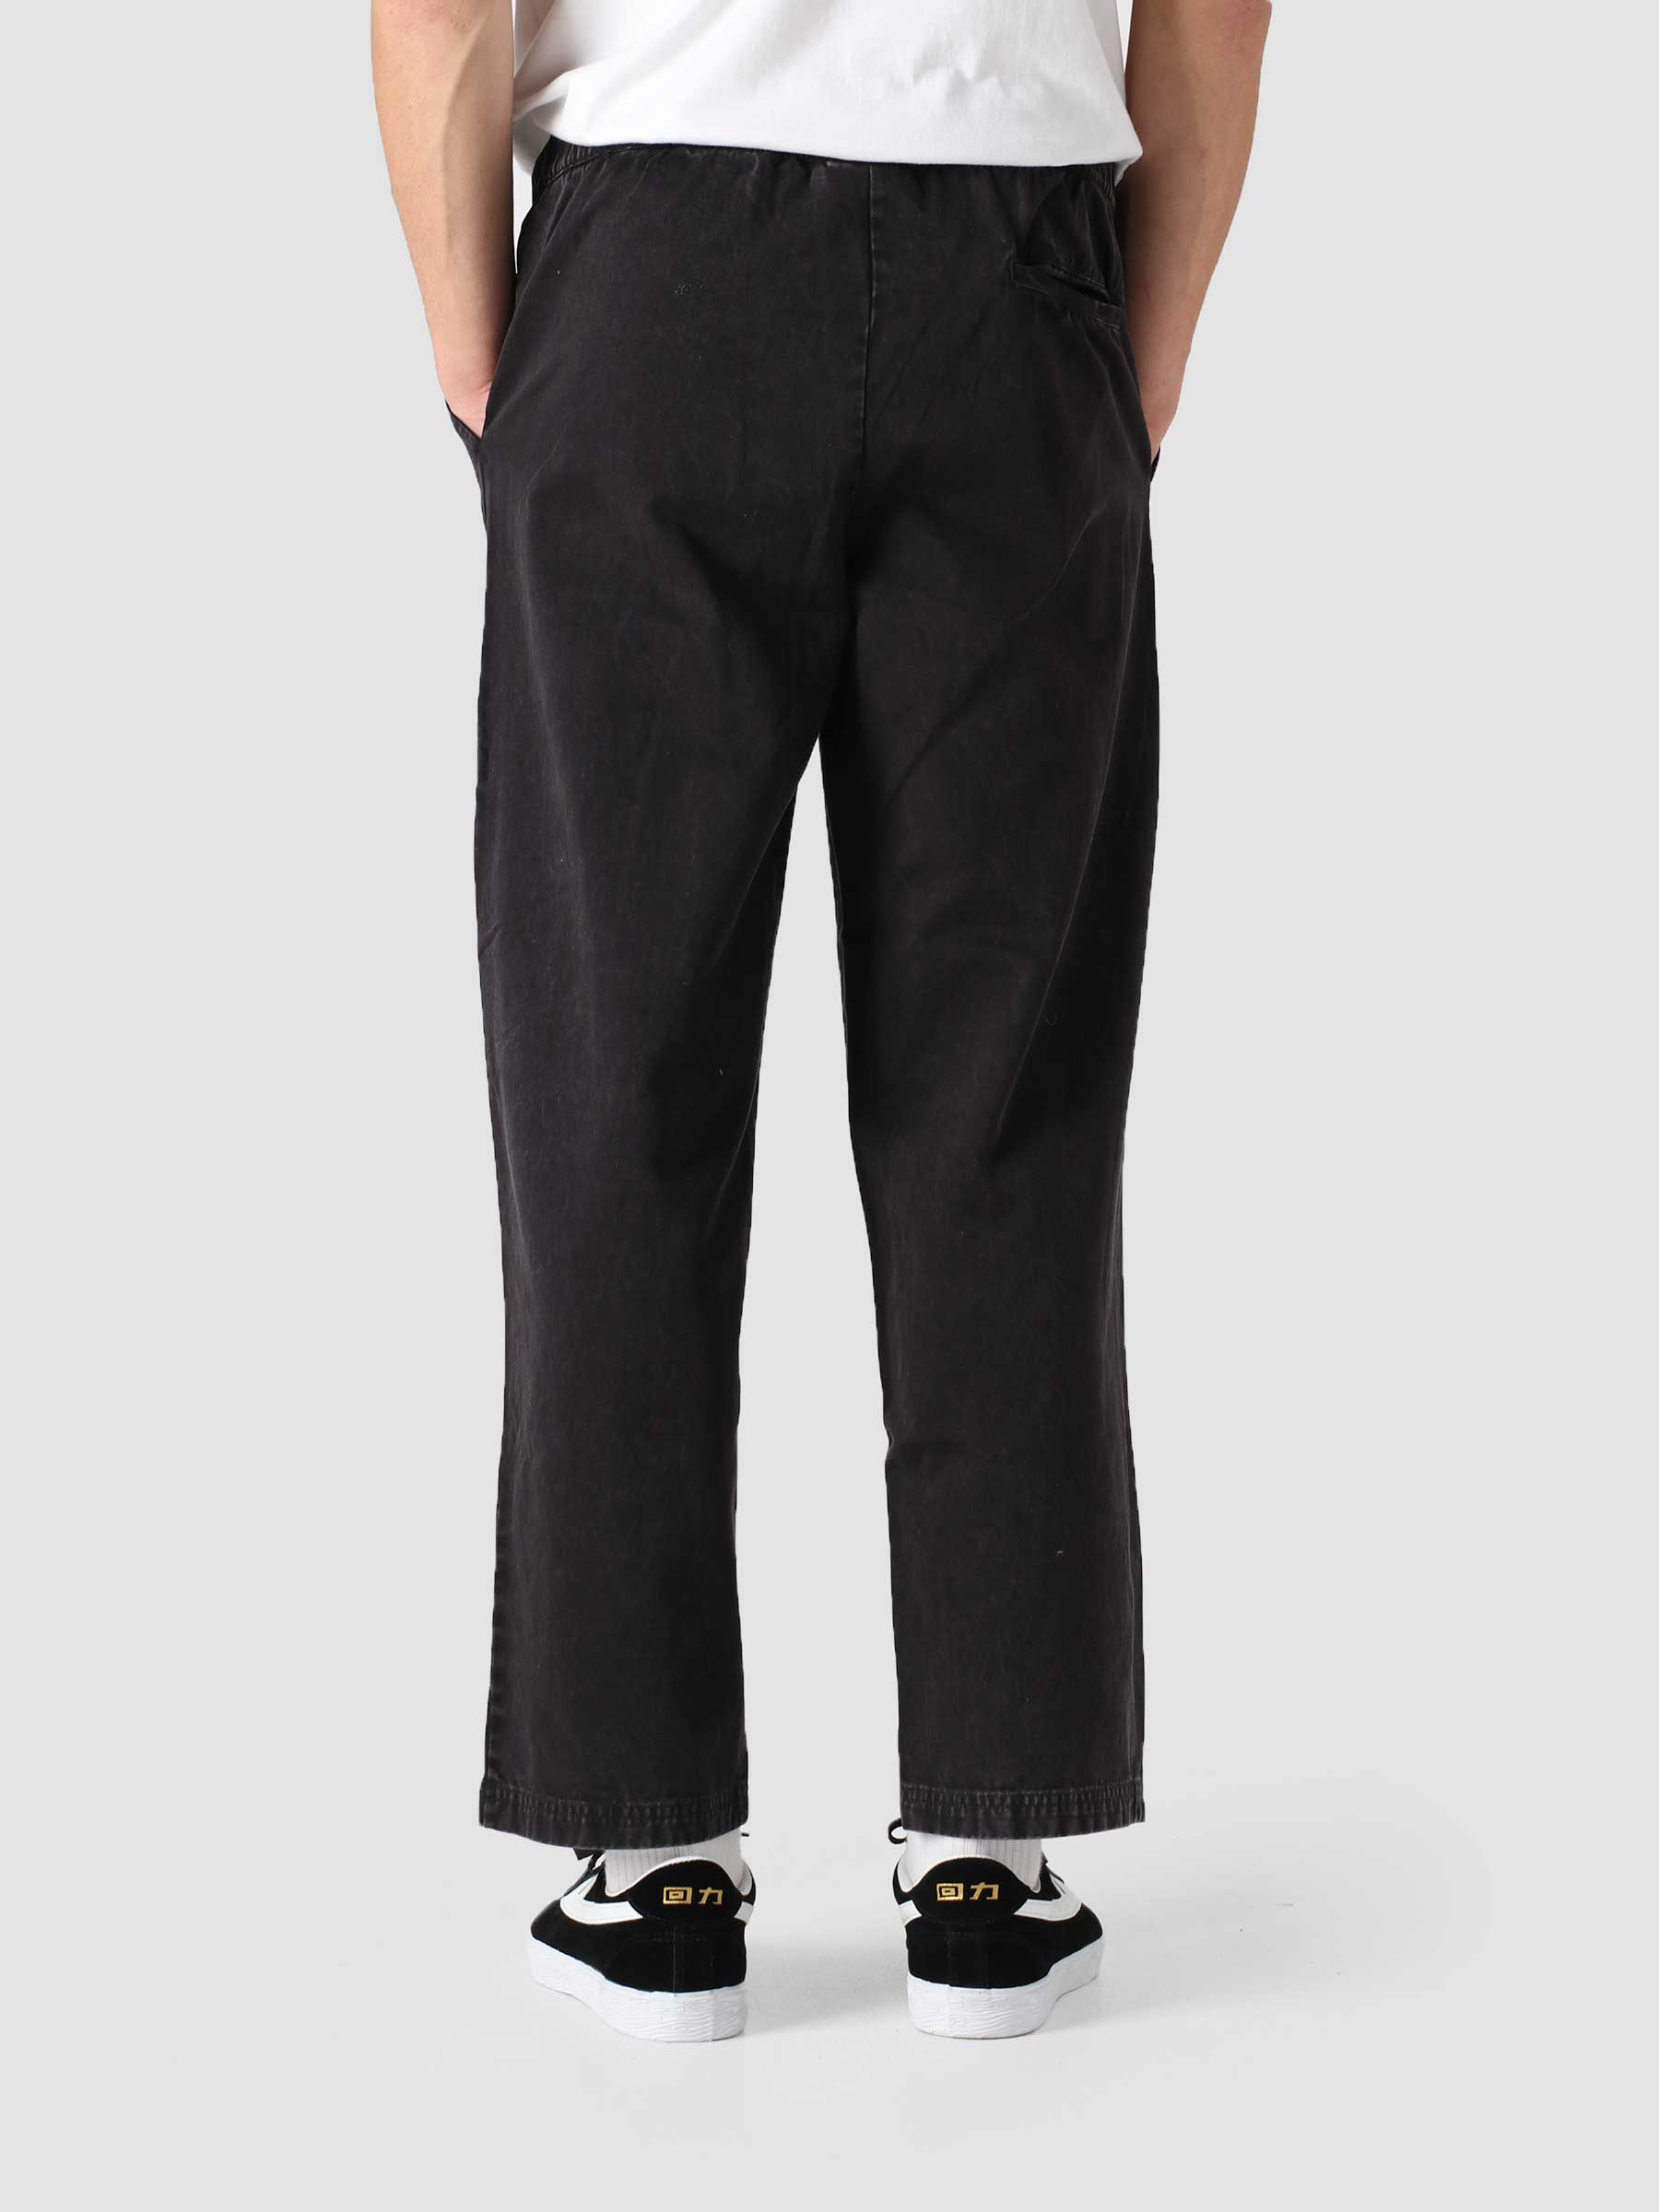 Cotton Twill Pants Black COWO8Q-KK001